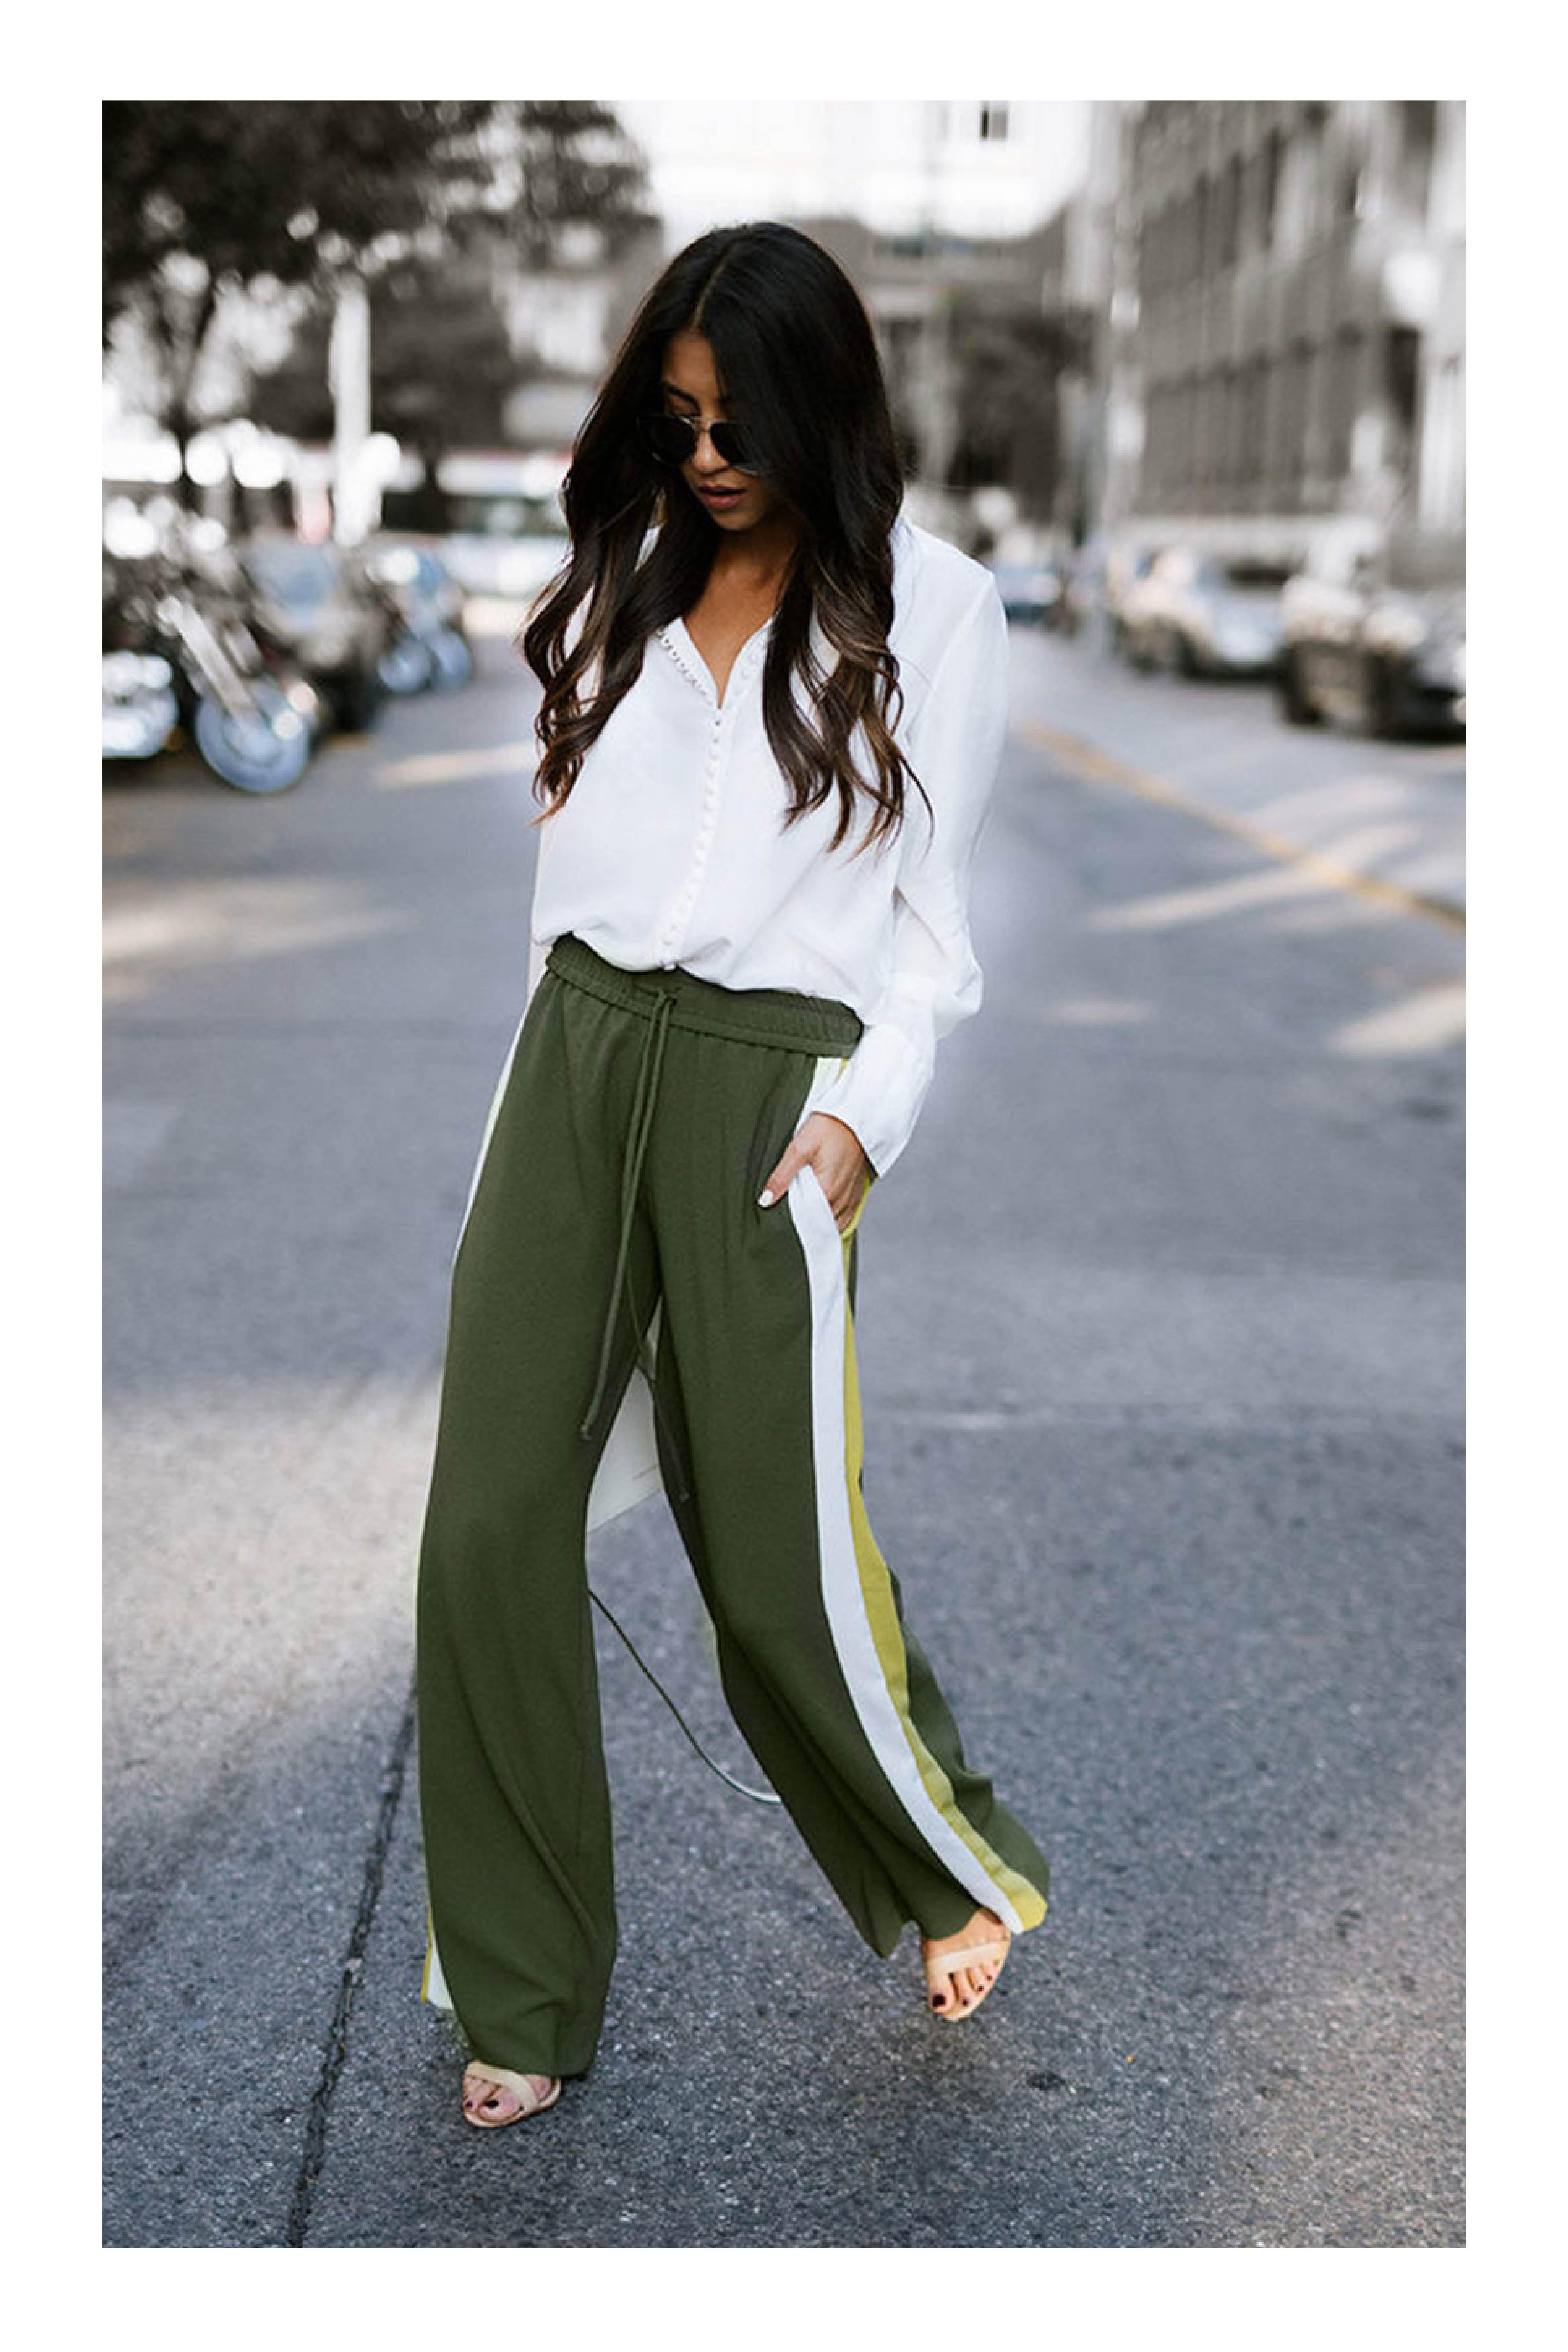 9f12a646da Cómo combinar el color verde militar  TiZKKAmoda  pantalón  verde  blusa   blanca  sandalias  look  fresco  casual